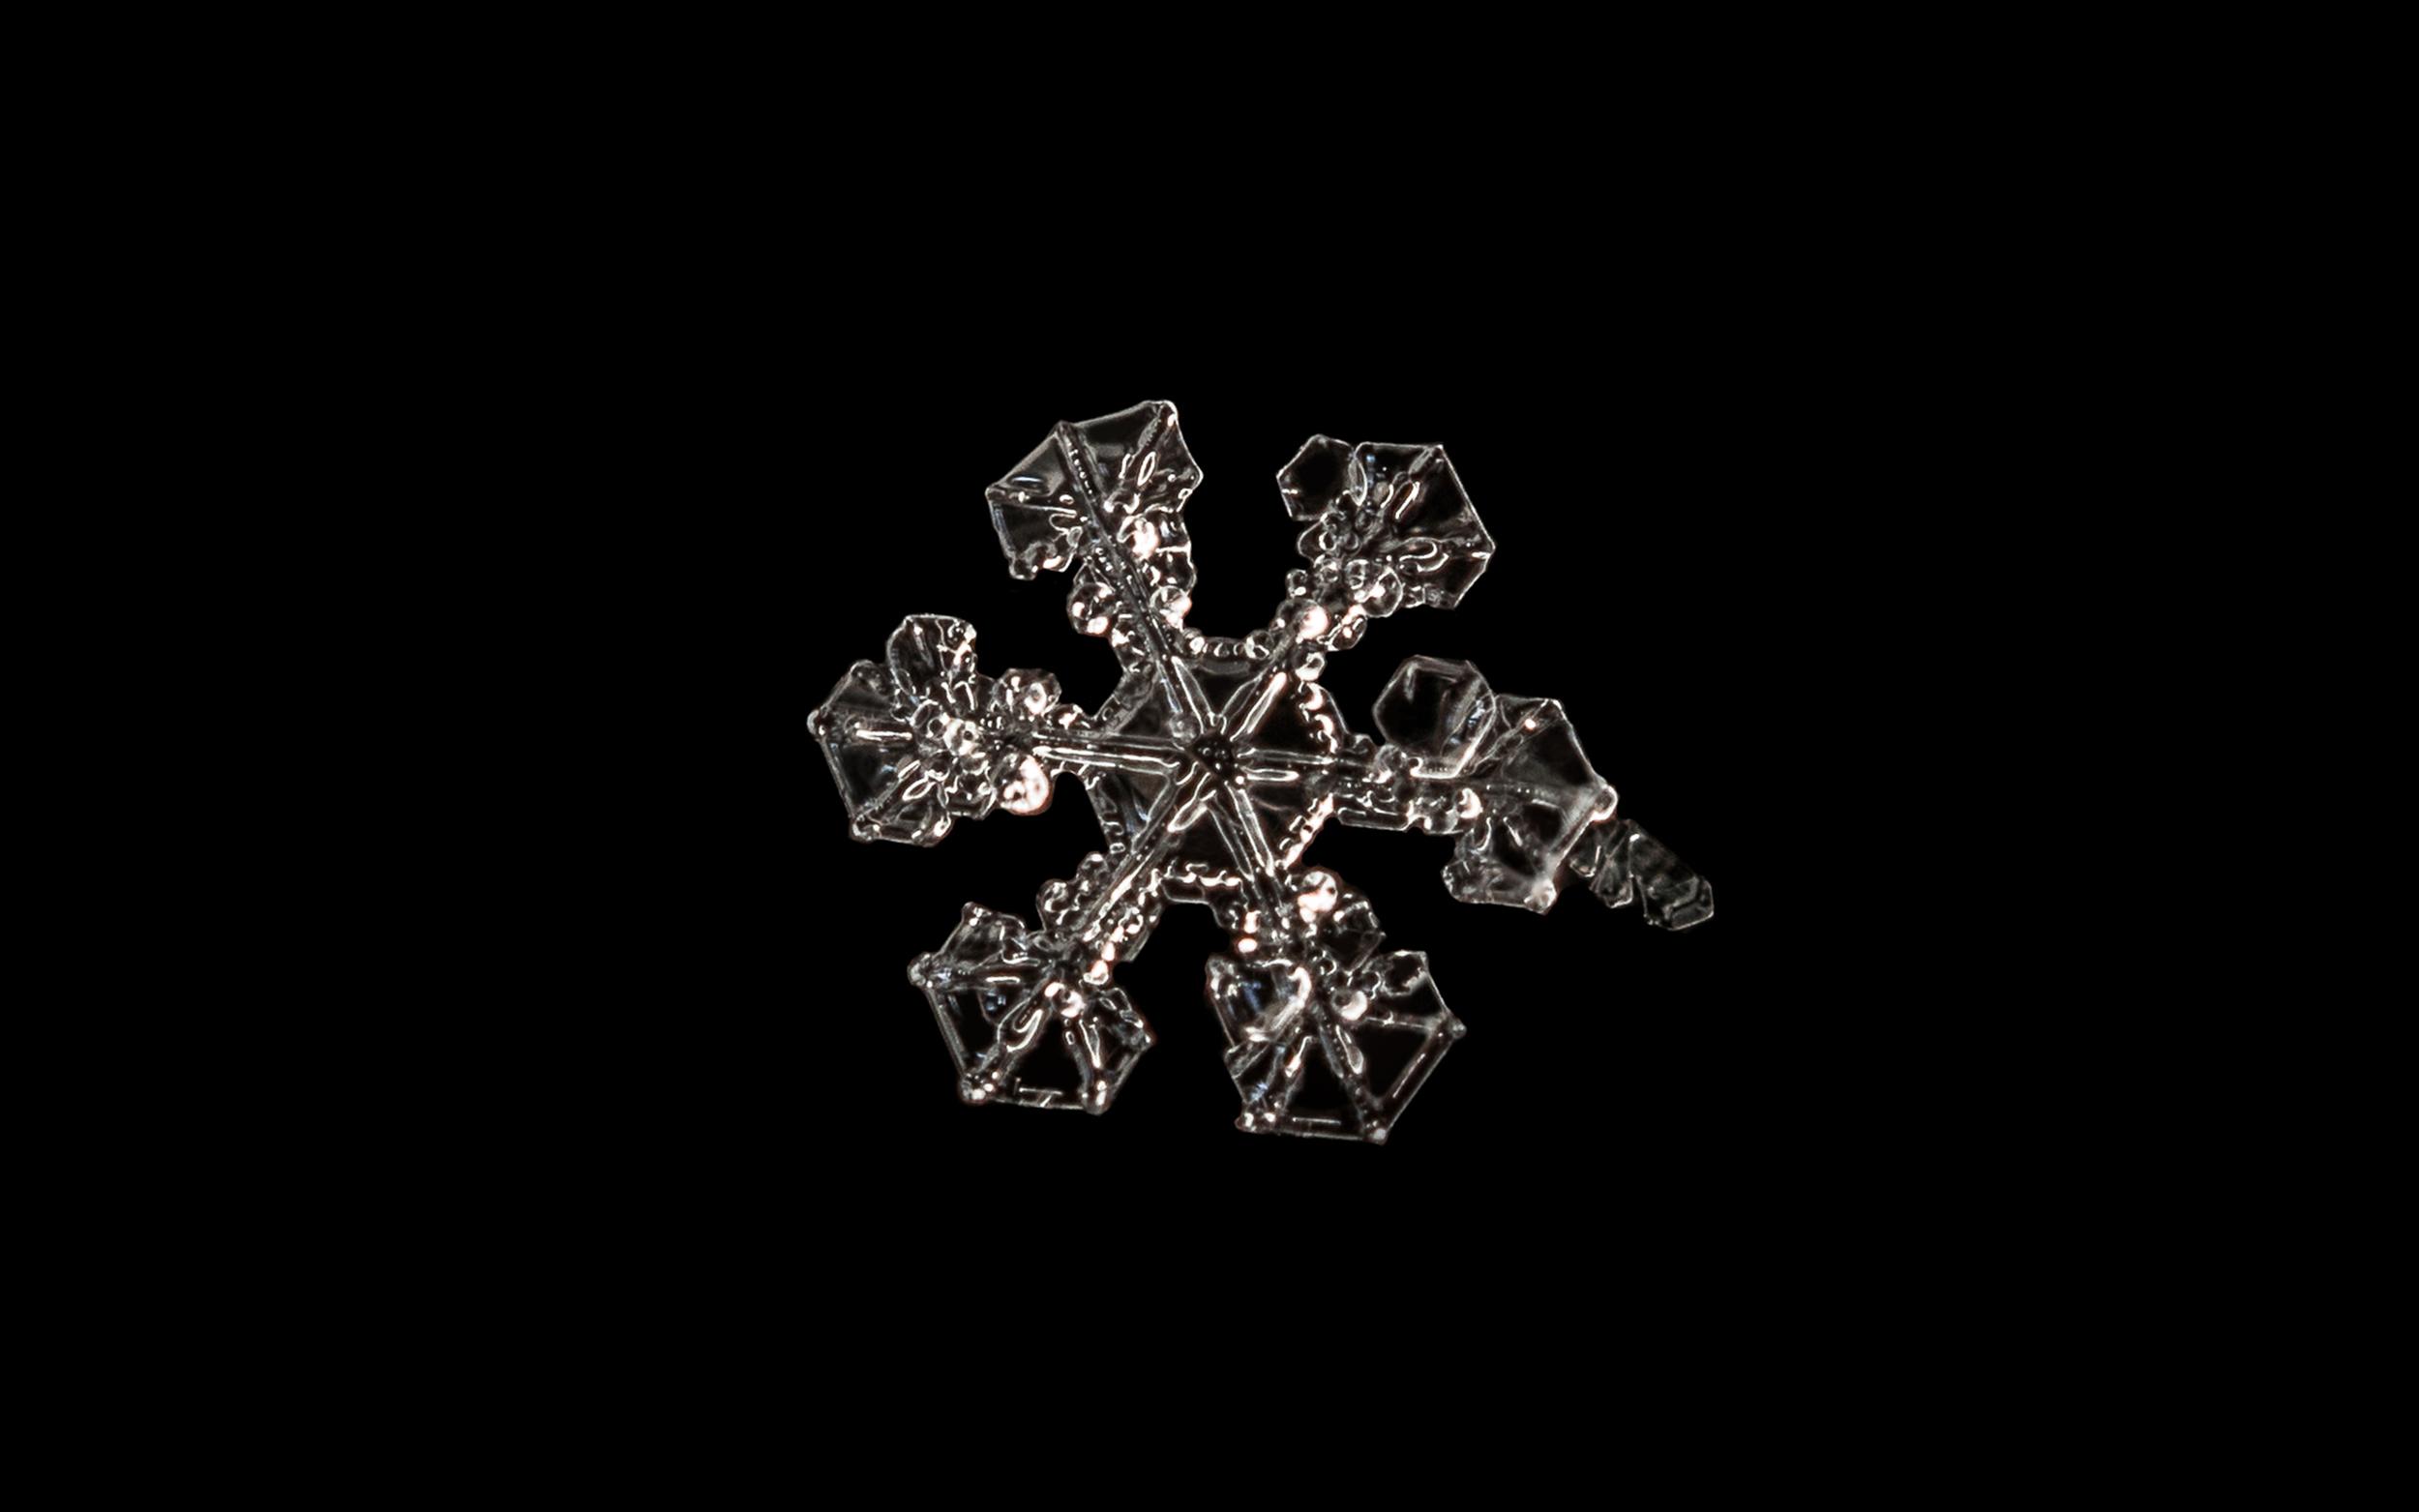 Snowflake Nº 8